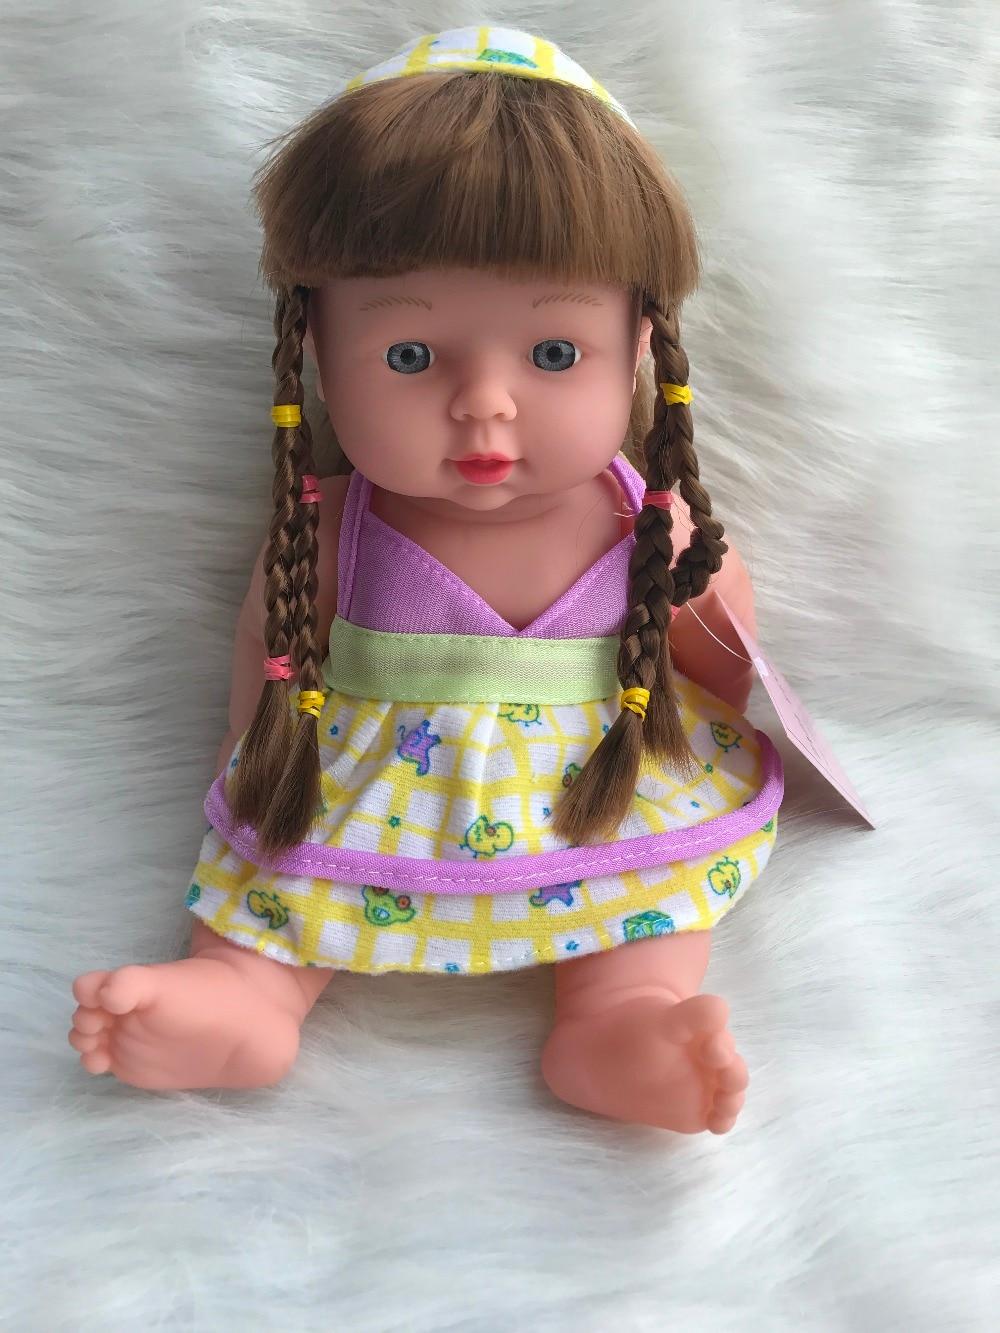 12 Inches Reborn Baby Doll Soft Vinyl Silicone Lifelike